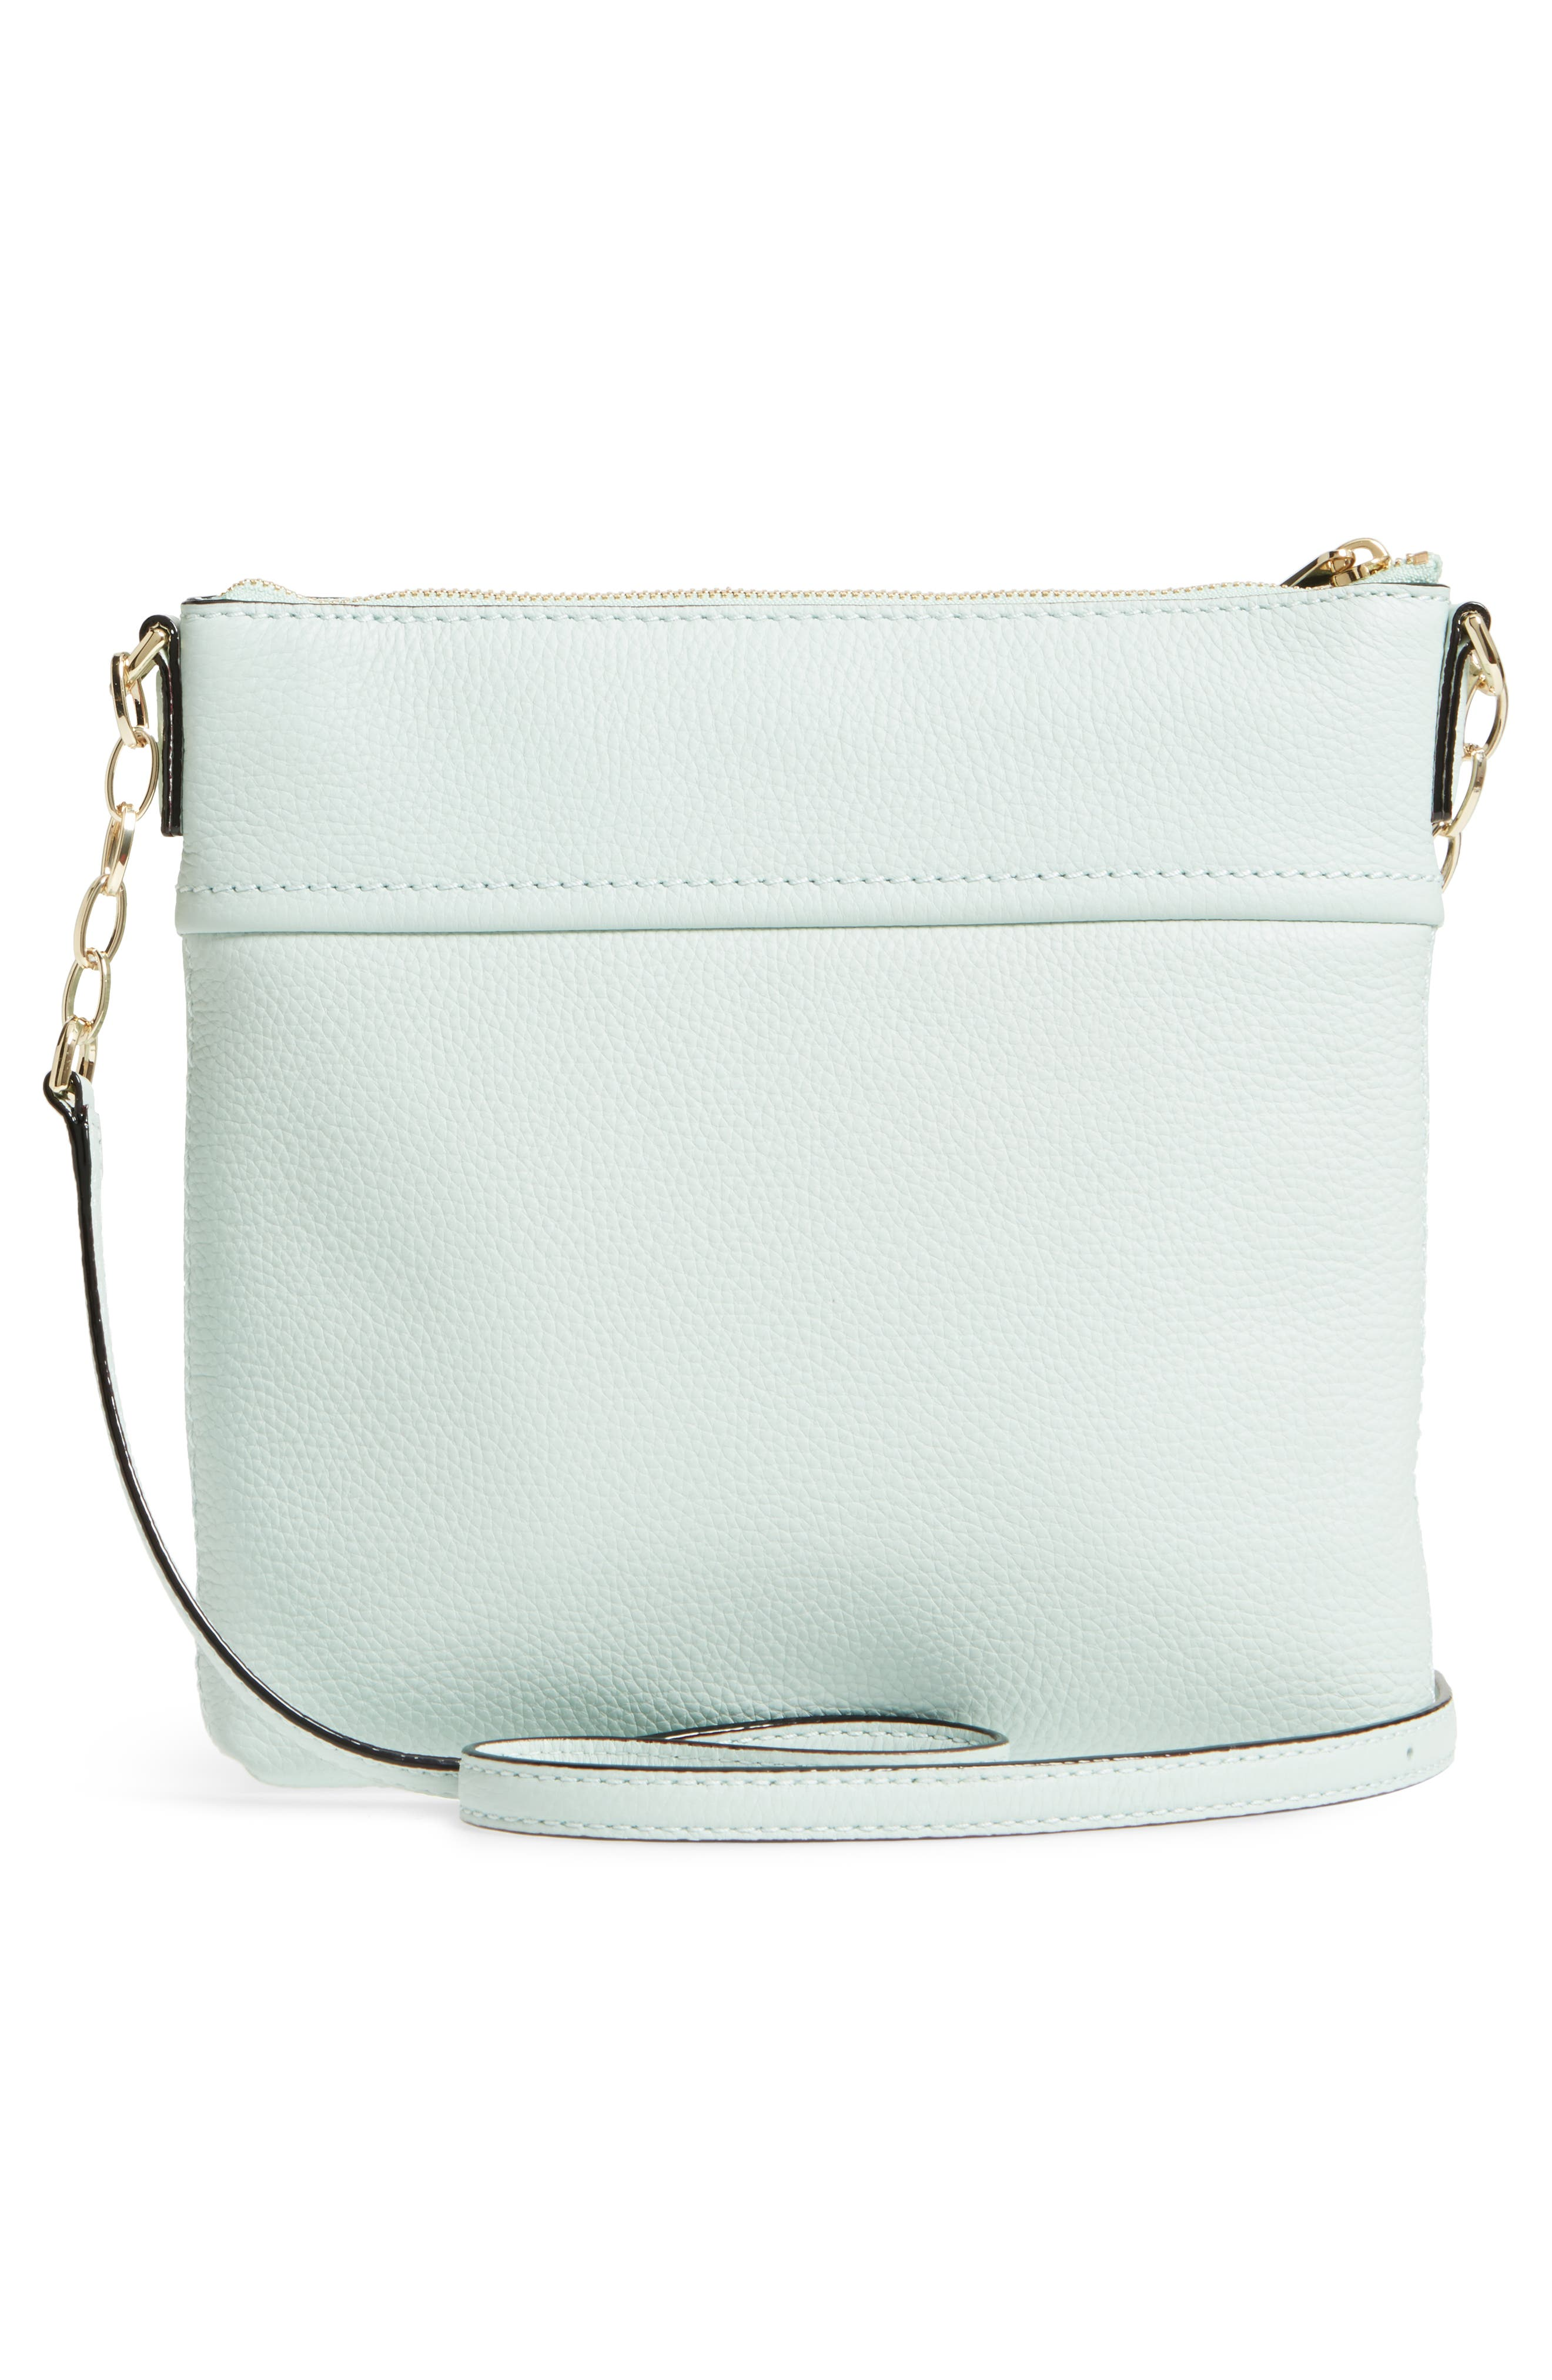 jackson street - melisse crossbody bag,                             Alternate thumbnail 3, color,                             Misty Mint